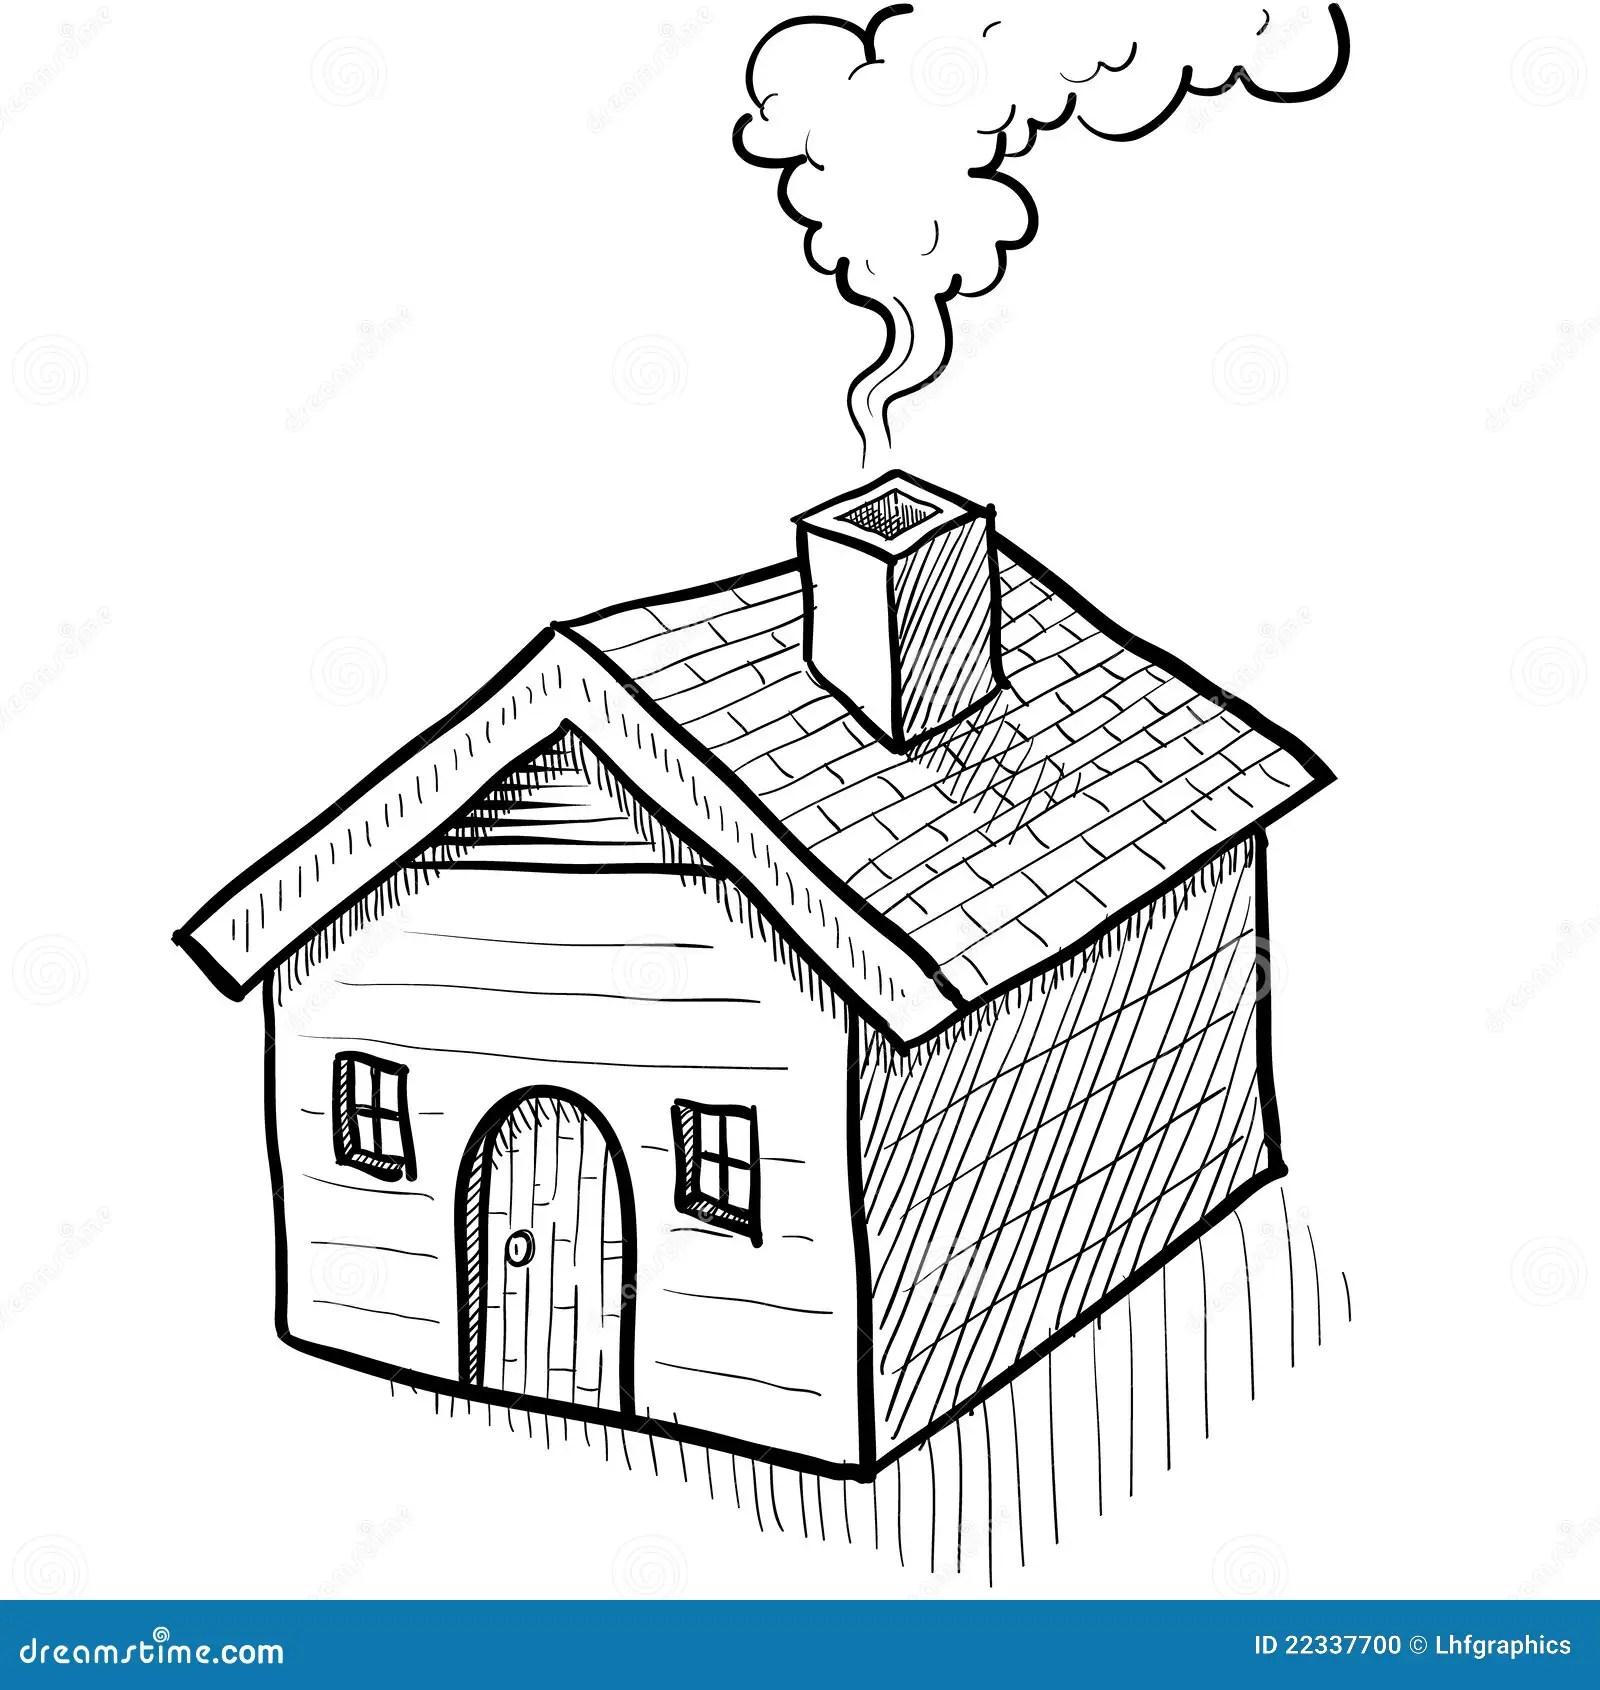 Esboco Comfy Da Casa Ilustracao Do Vetor Ilustracao De